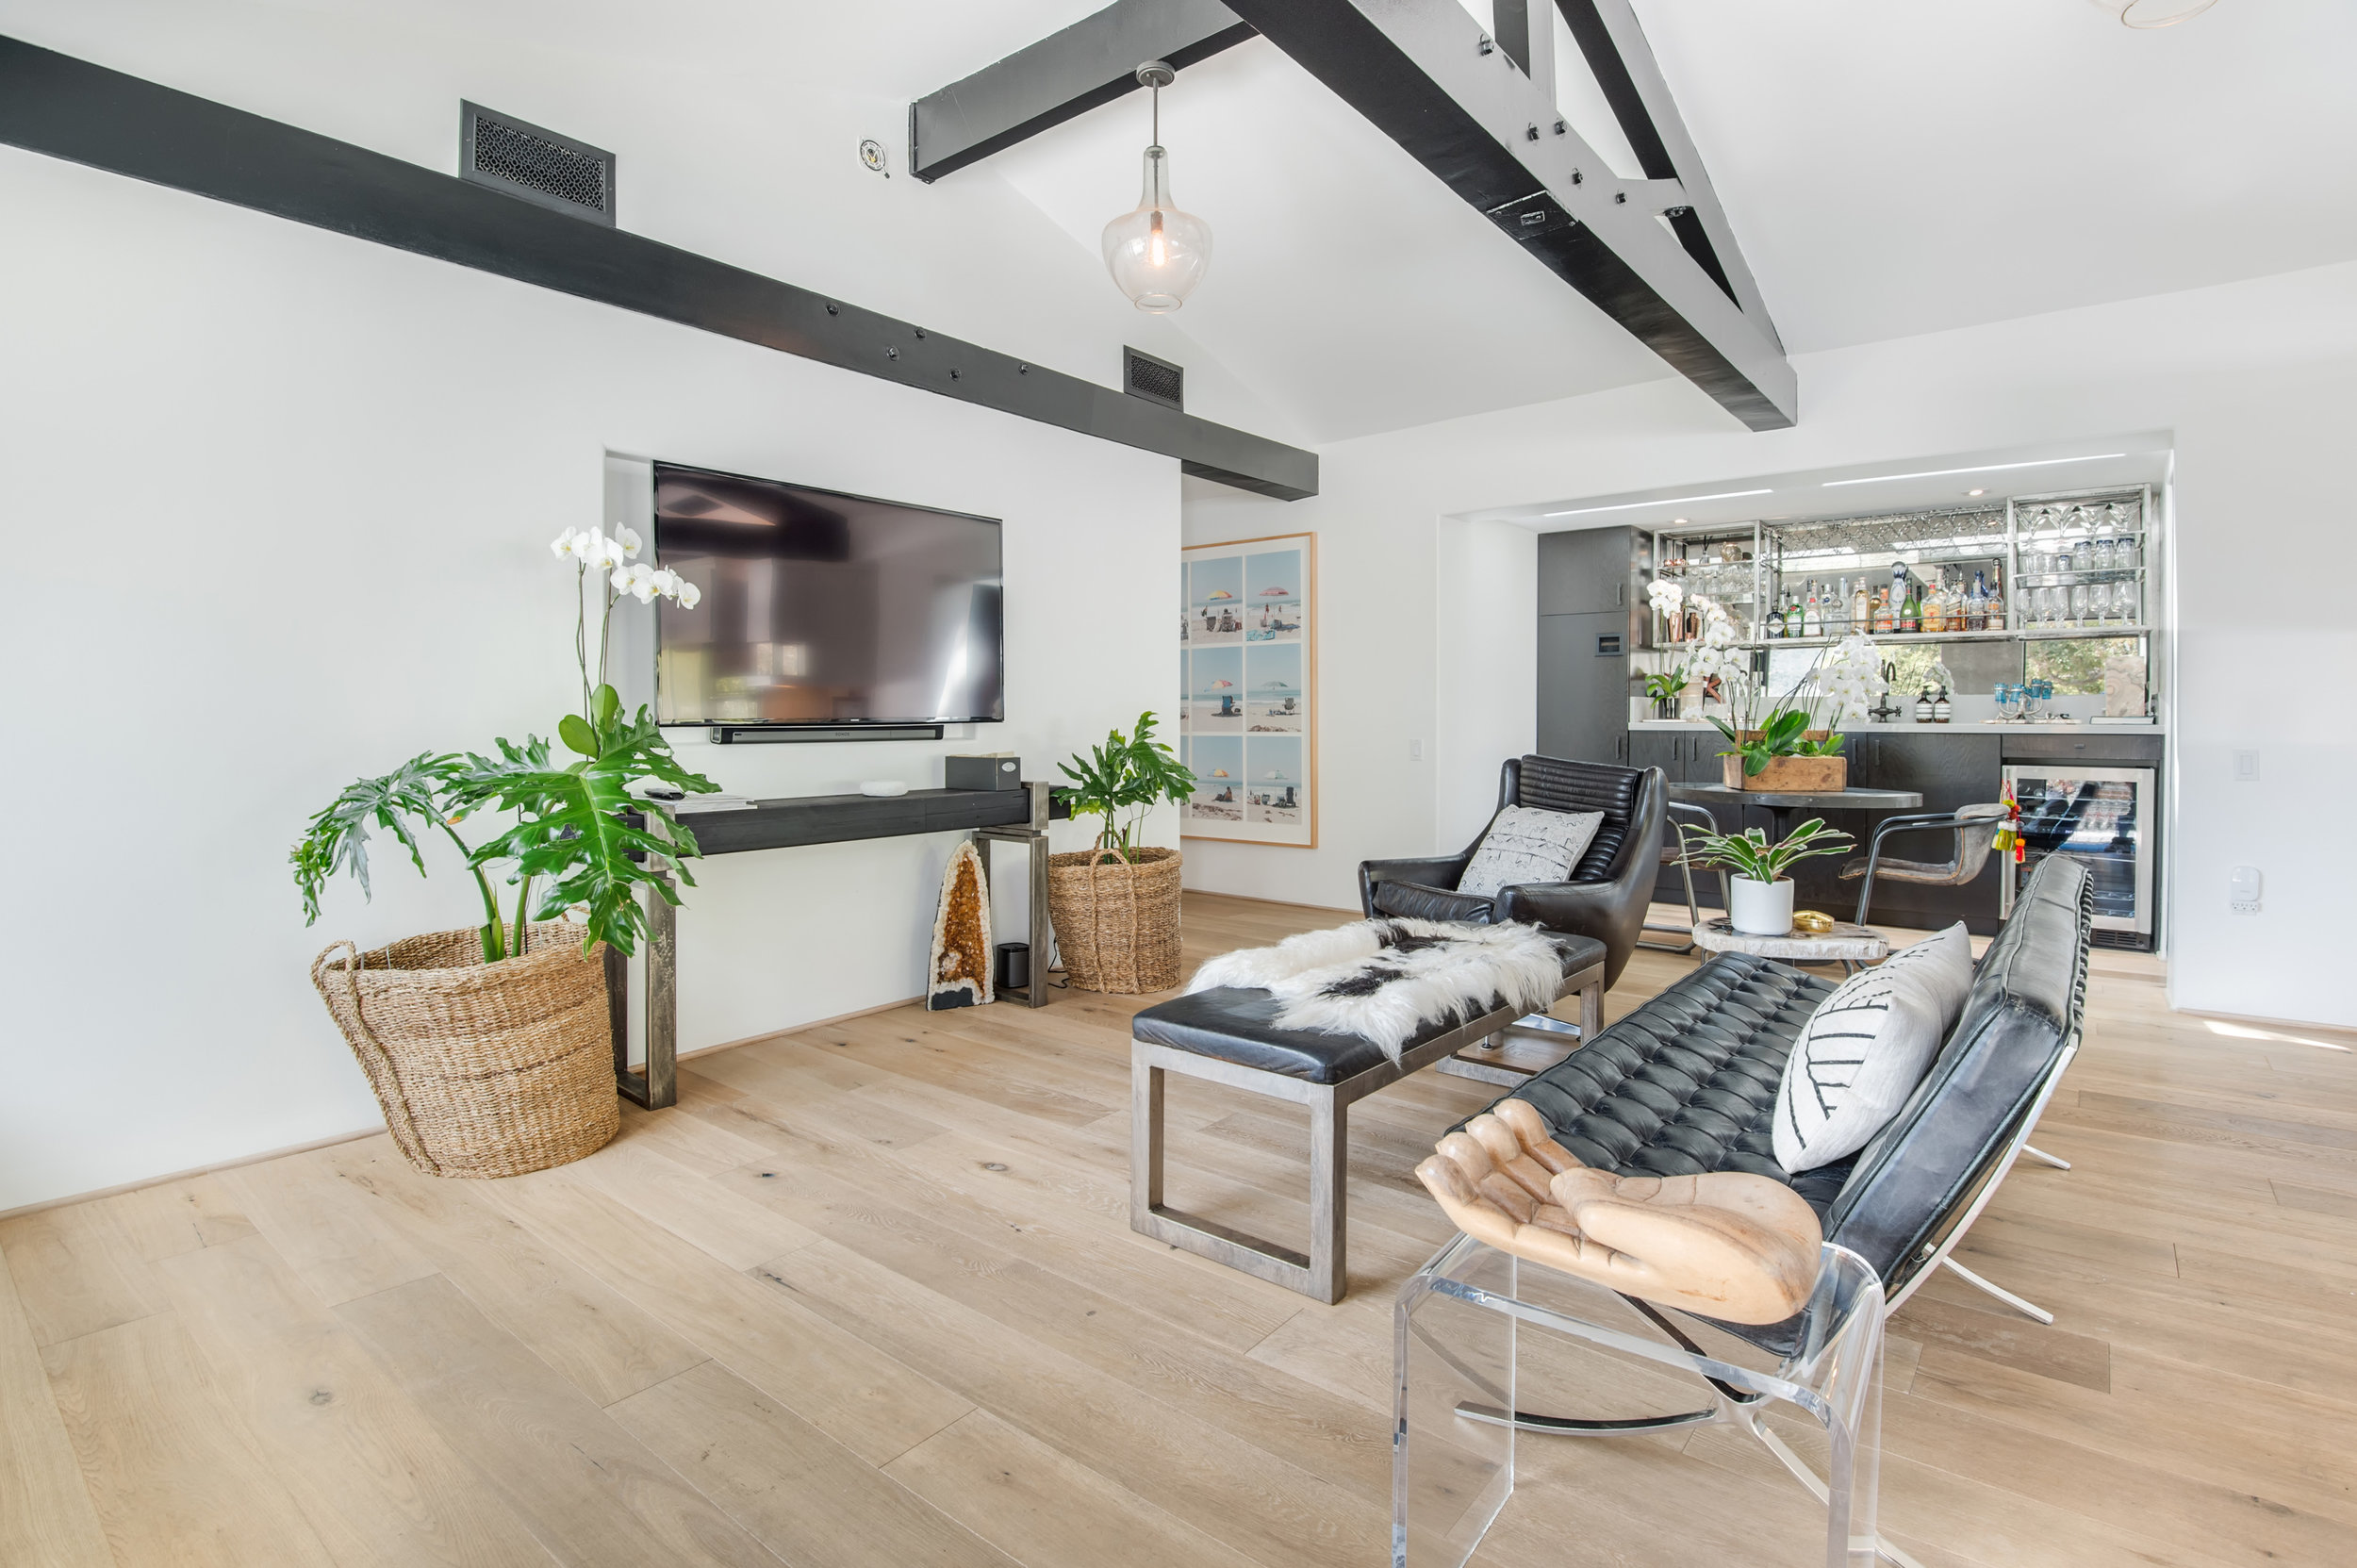 010 Living Room 26272 Cool Glen Way Malibu For Sale Luxury Real Estate.jpg